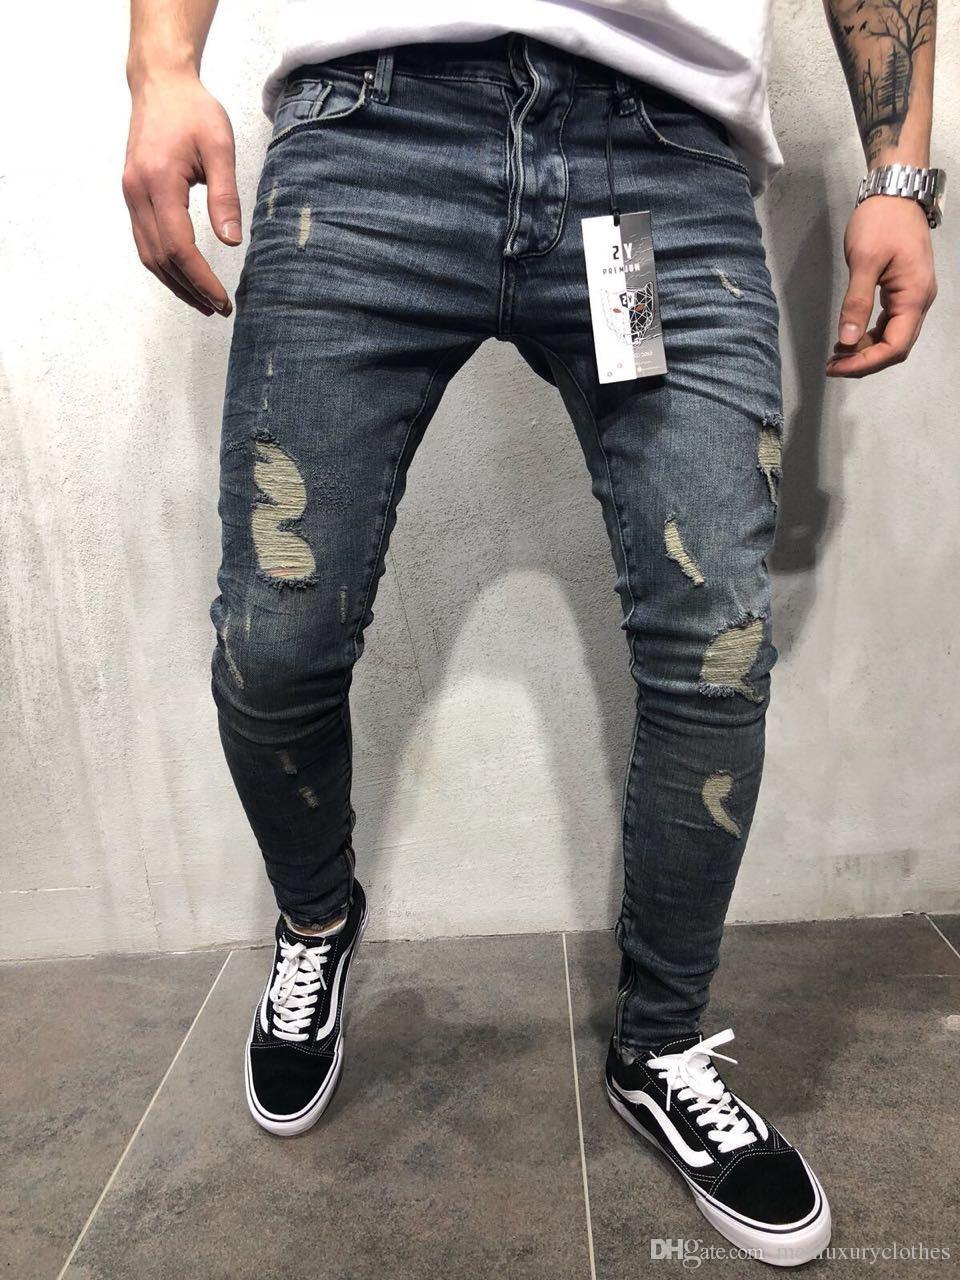 3c87b1222c8eb Compre High Street Slim Fit Ripped Jeans Para Hombres Ropa Pantalones Lápiz Pantalones  Jean Zipper Designer 2018 A  48.44 Del Menluxuryclothes